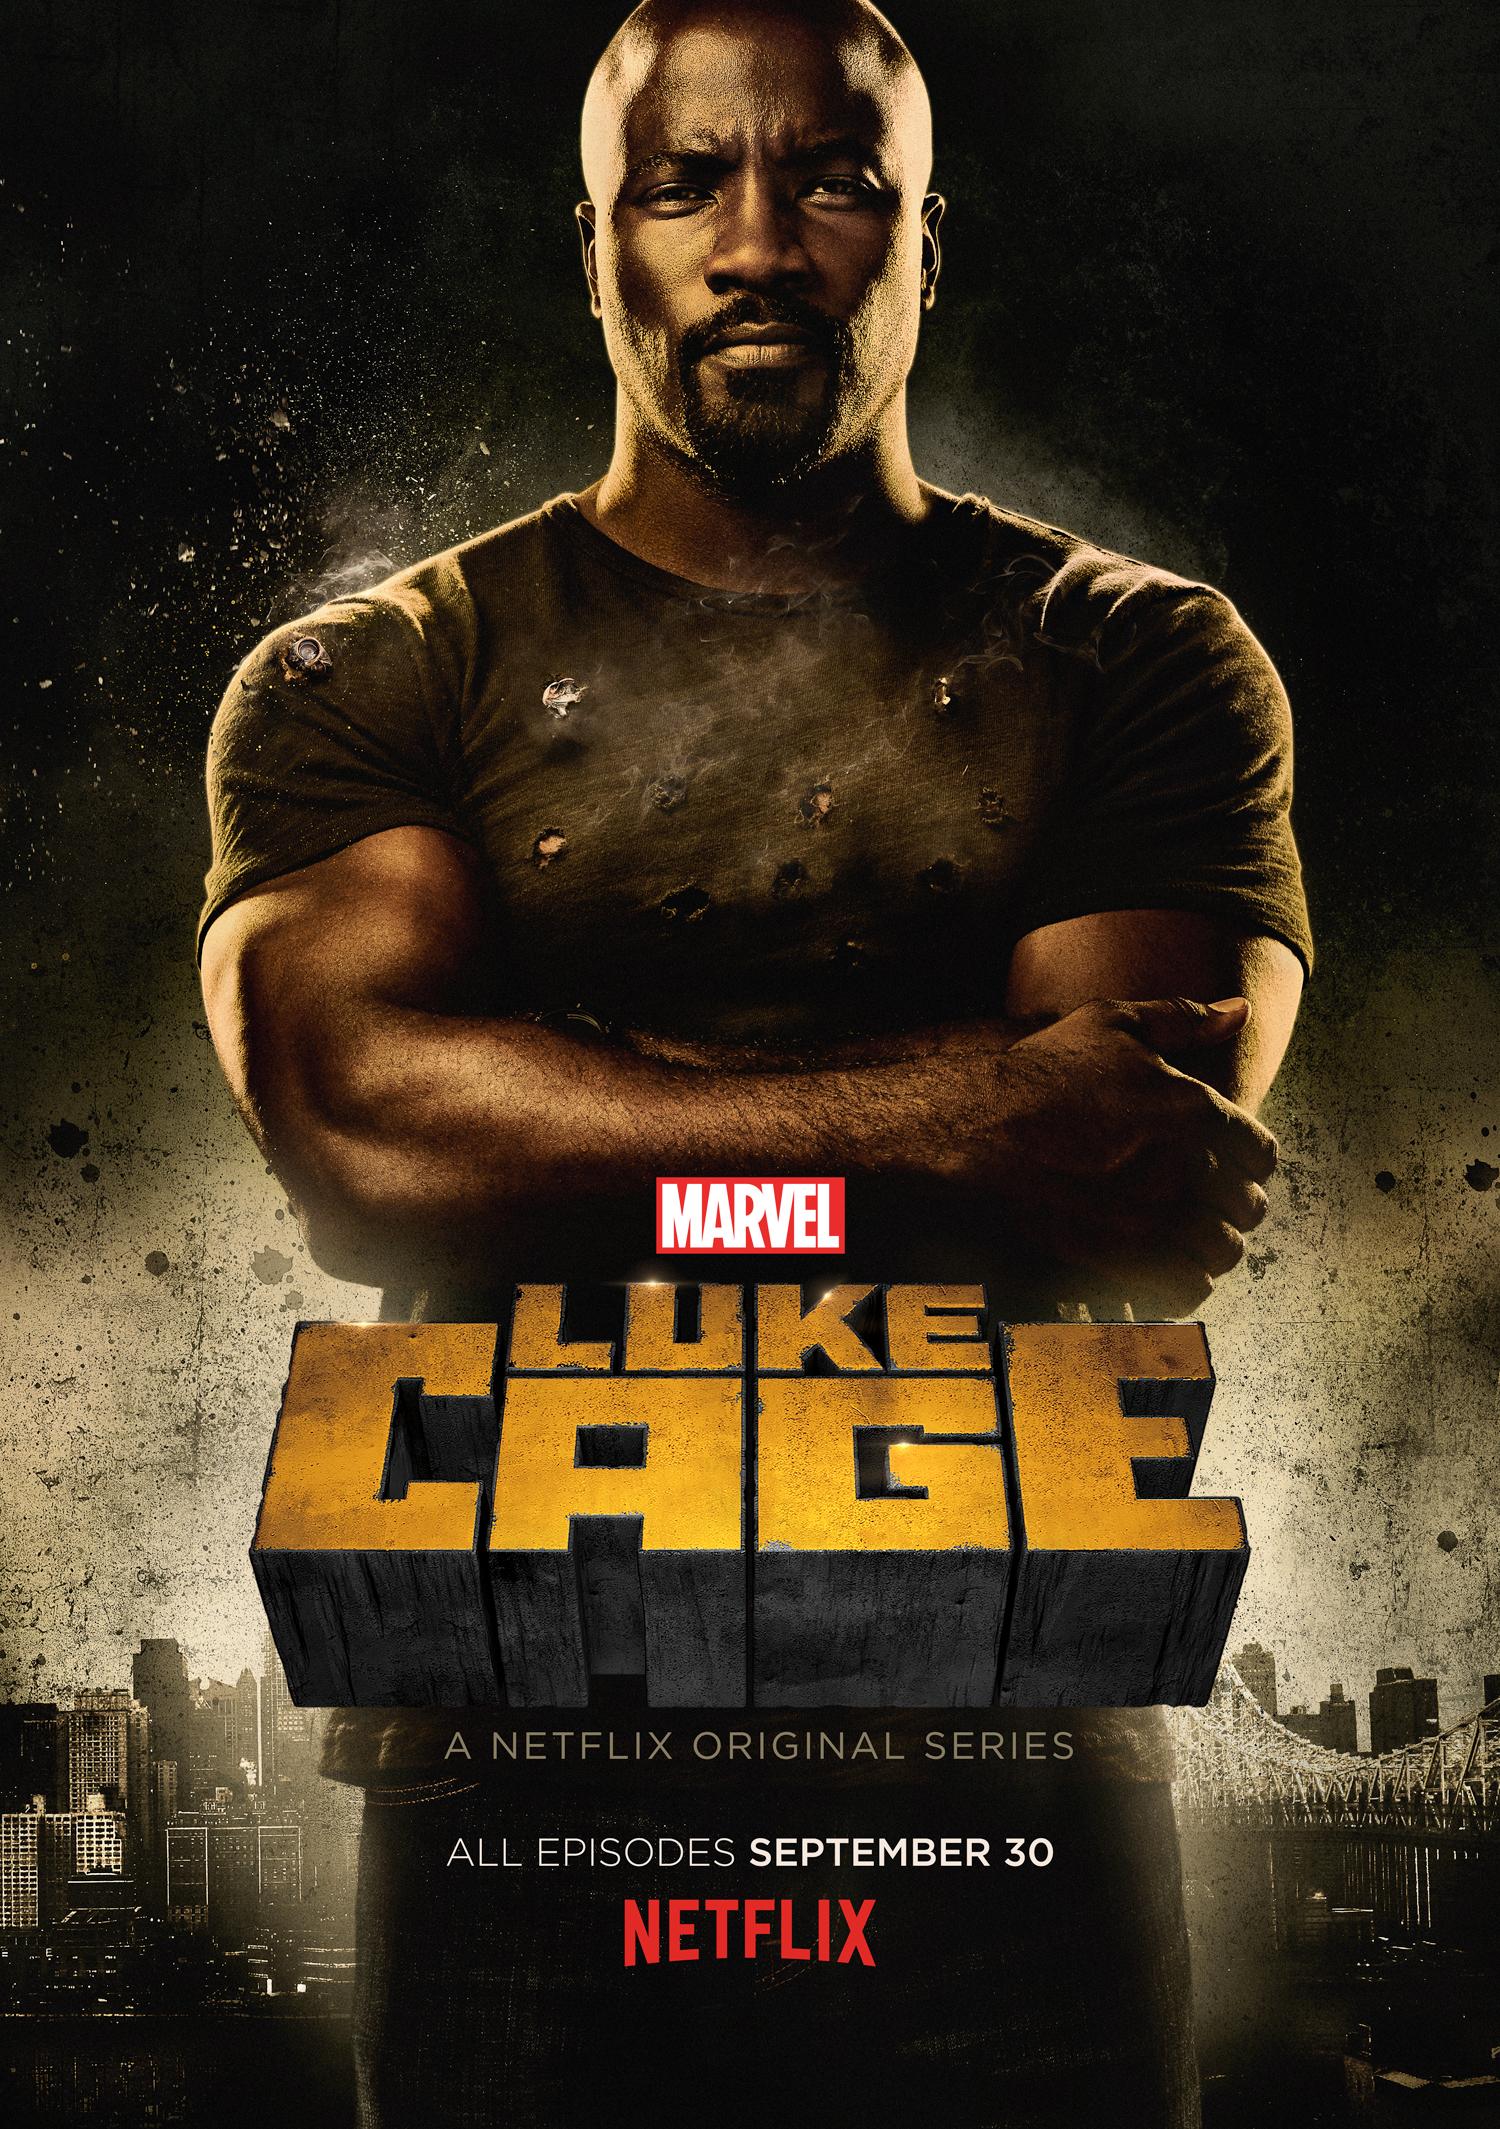 Luke Cage - Netflix - Marvel - Affiche